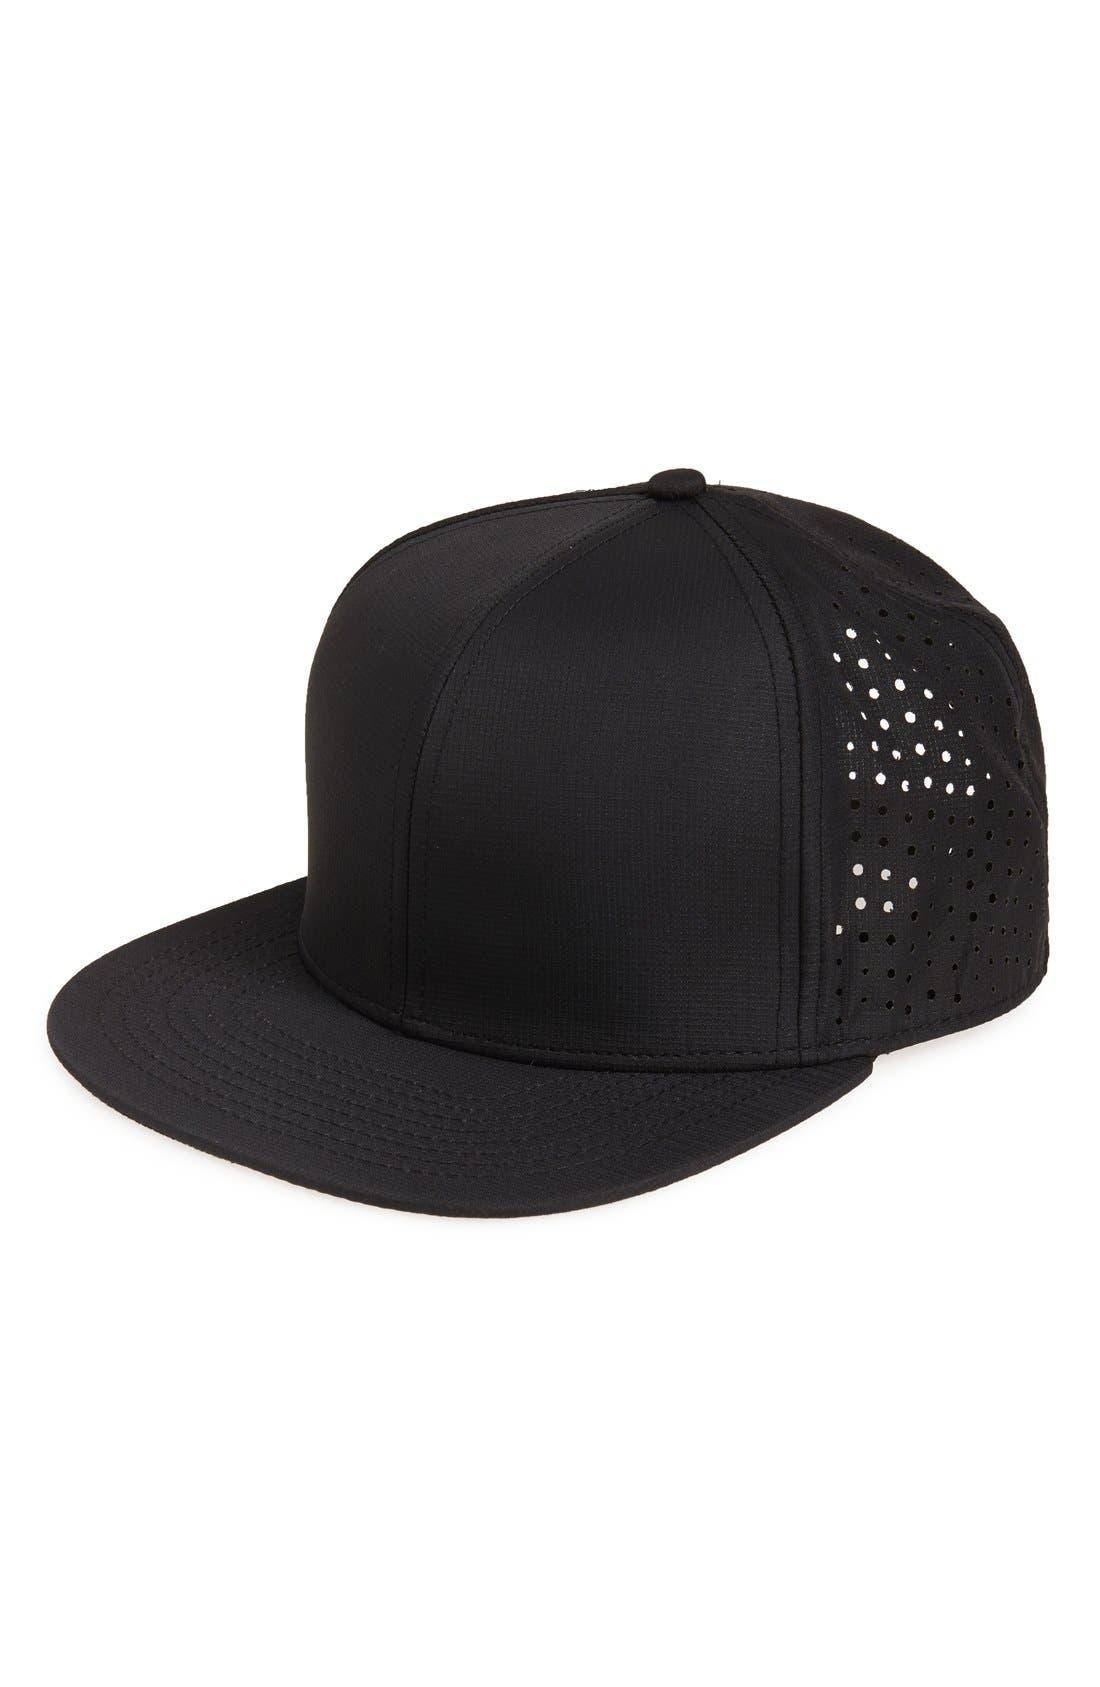 Alternate Image 1 Selected - Topman 'Tech' Snapback Cap